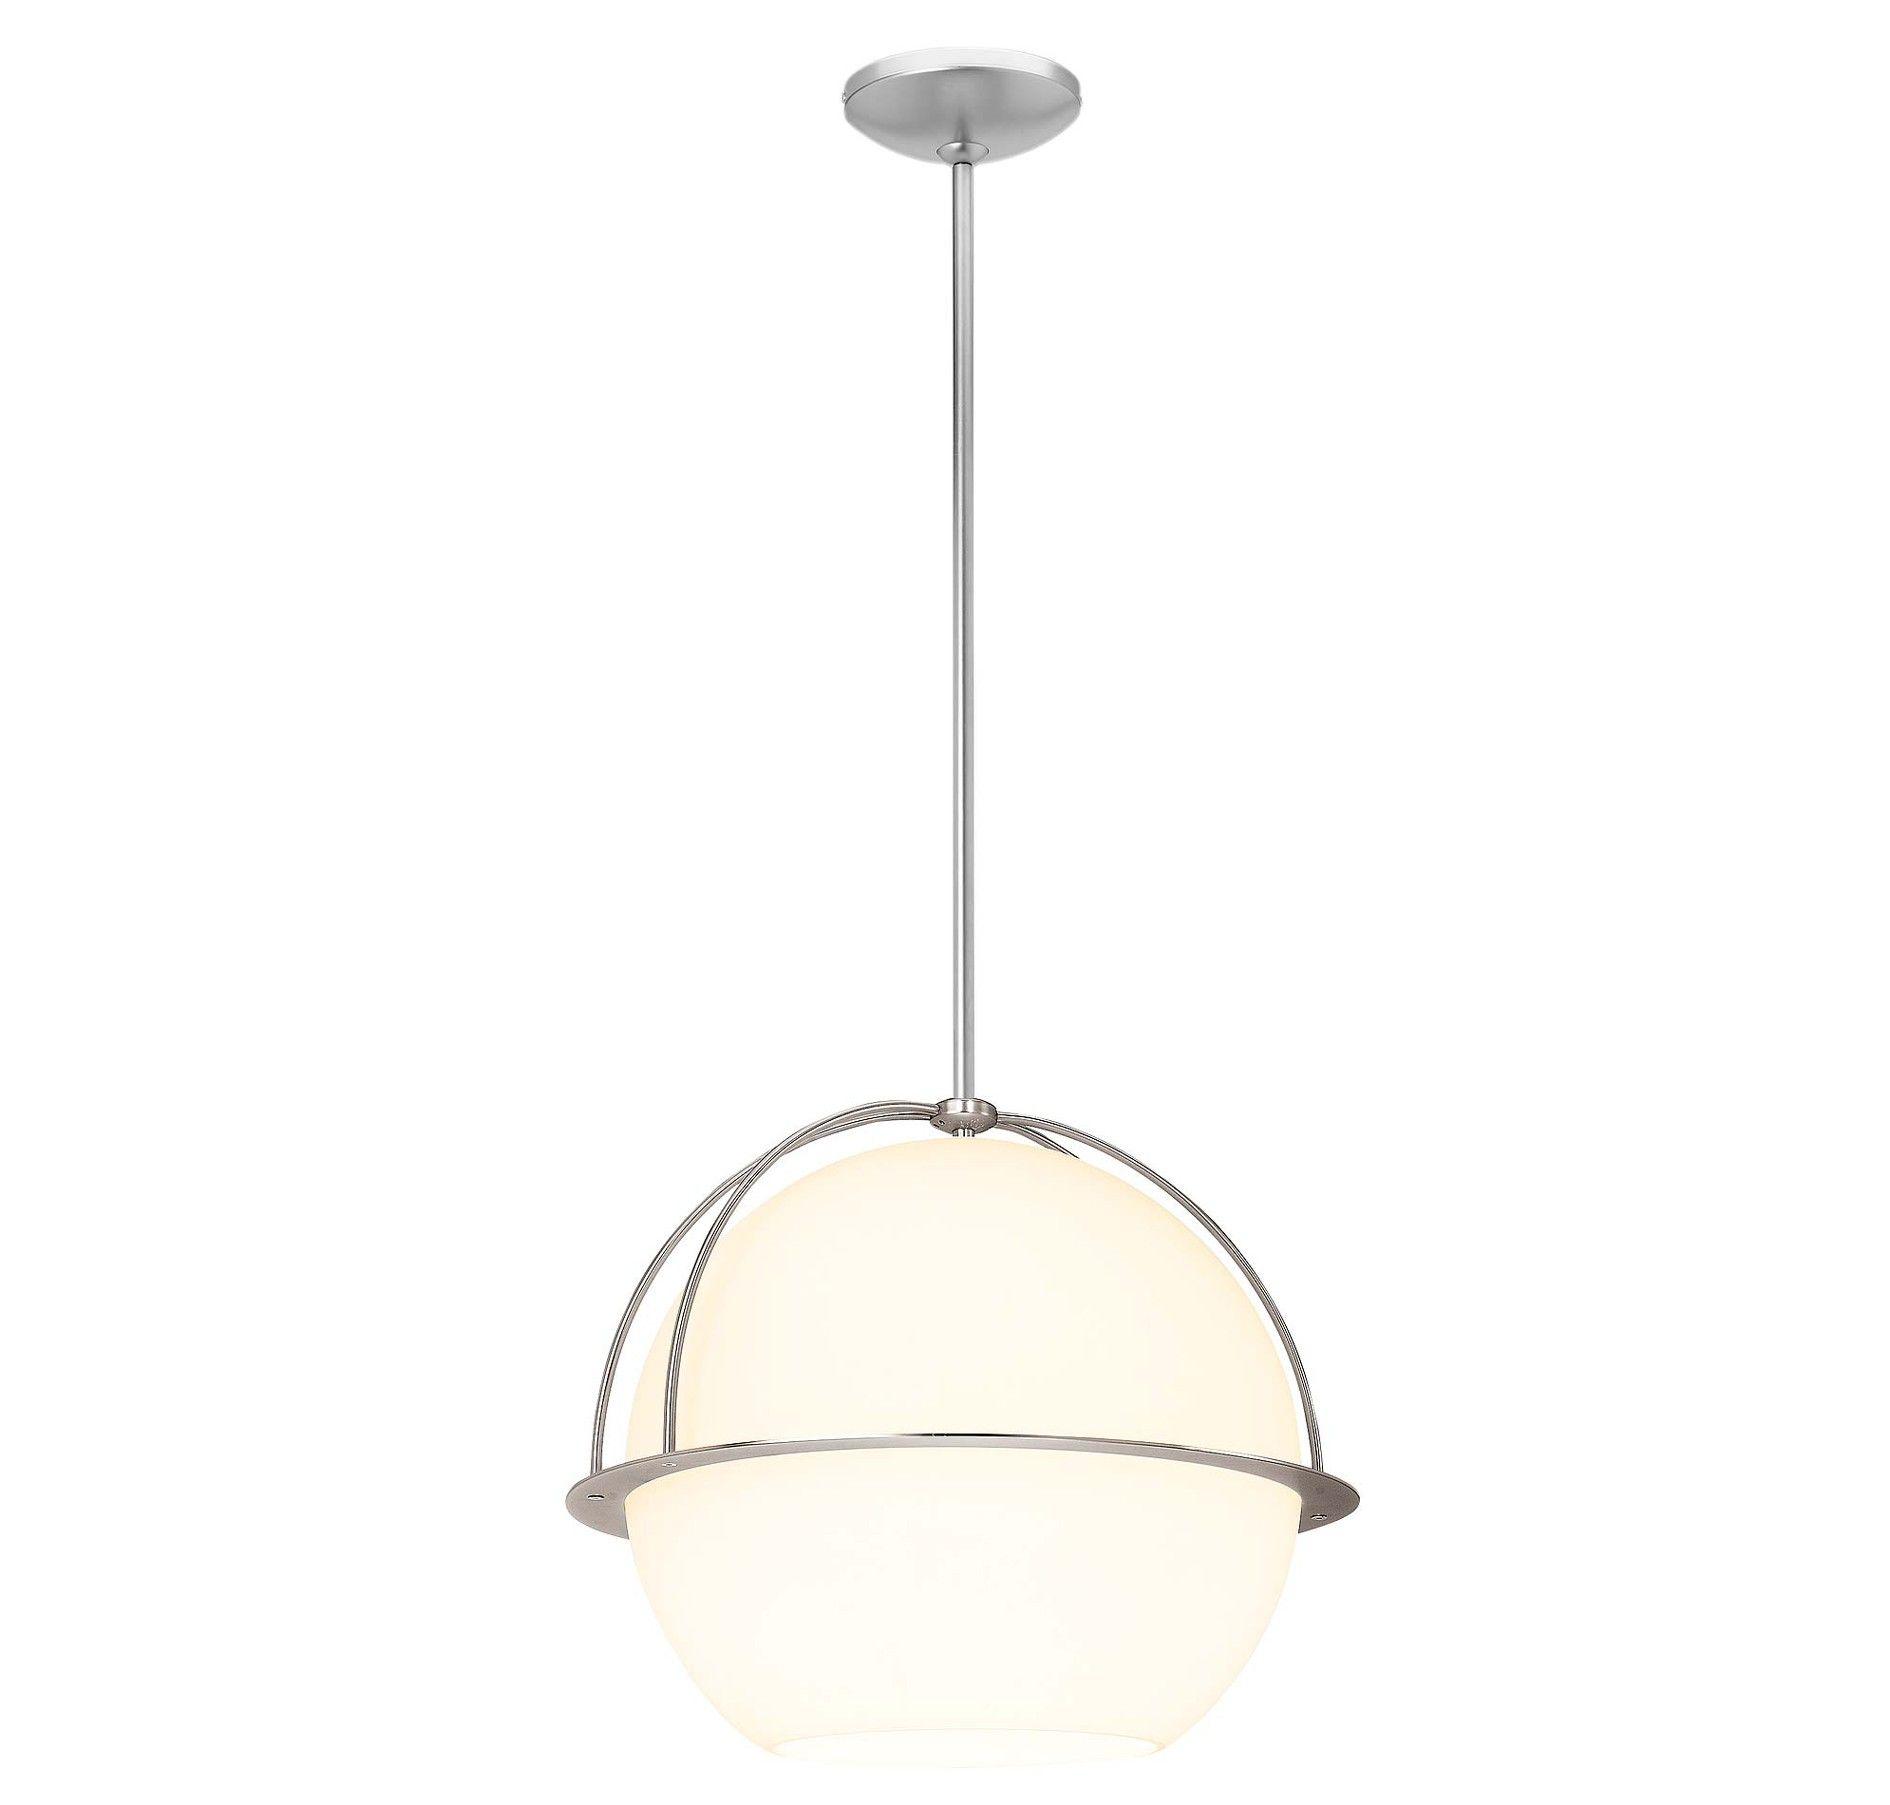 Access lighting 52045 bsopl nitrogen pendant in ceiling lights access lighting 52045 bsopl nitrogen pendant in ceiling lights pendants ceiling aloadofball Choice Image